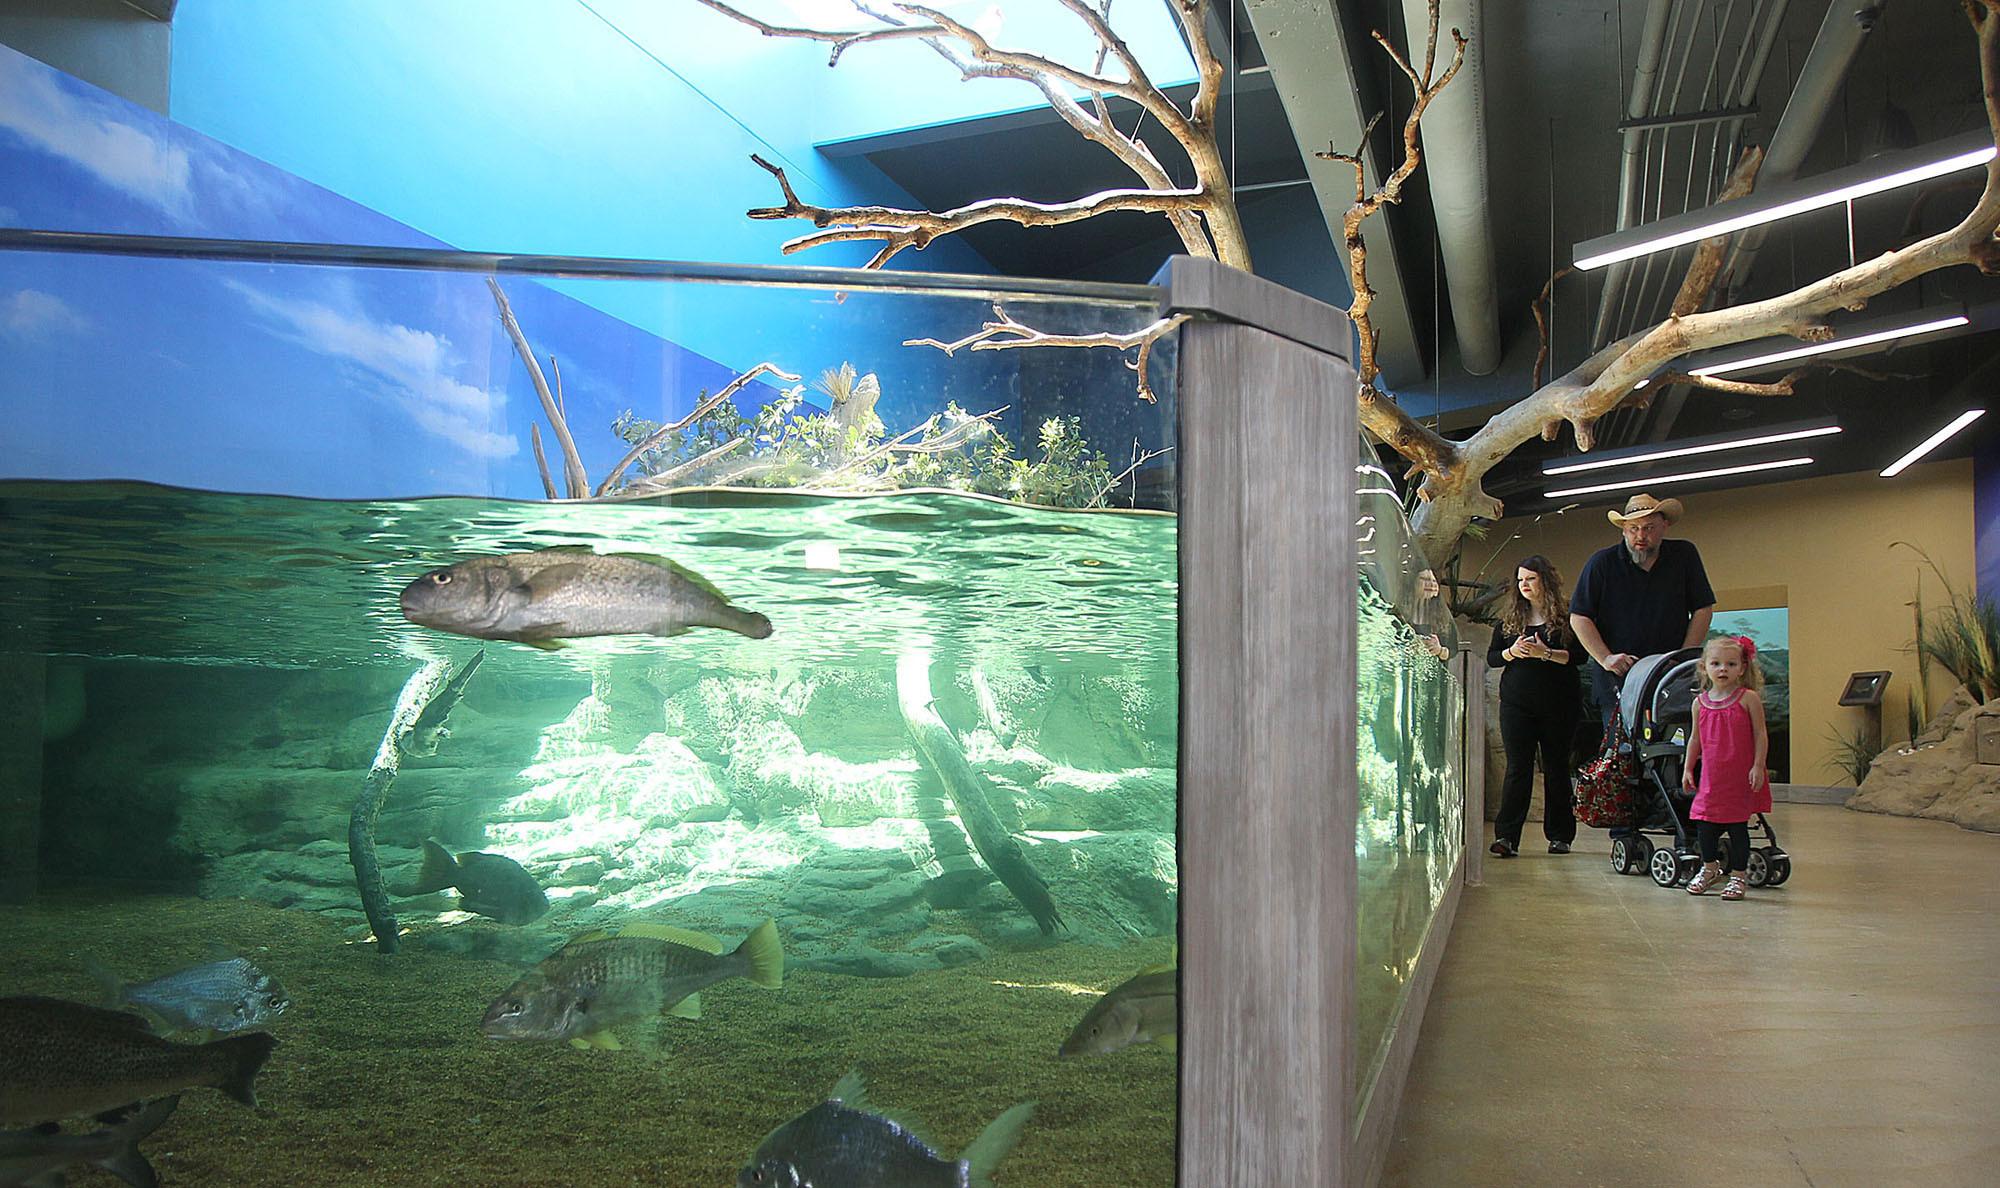 Texas Aquarium Accidentally Kills Nearly All Fish In Its